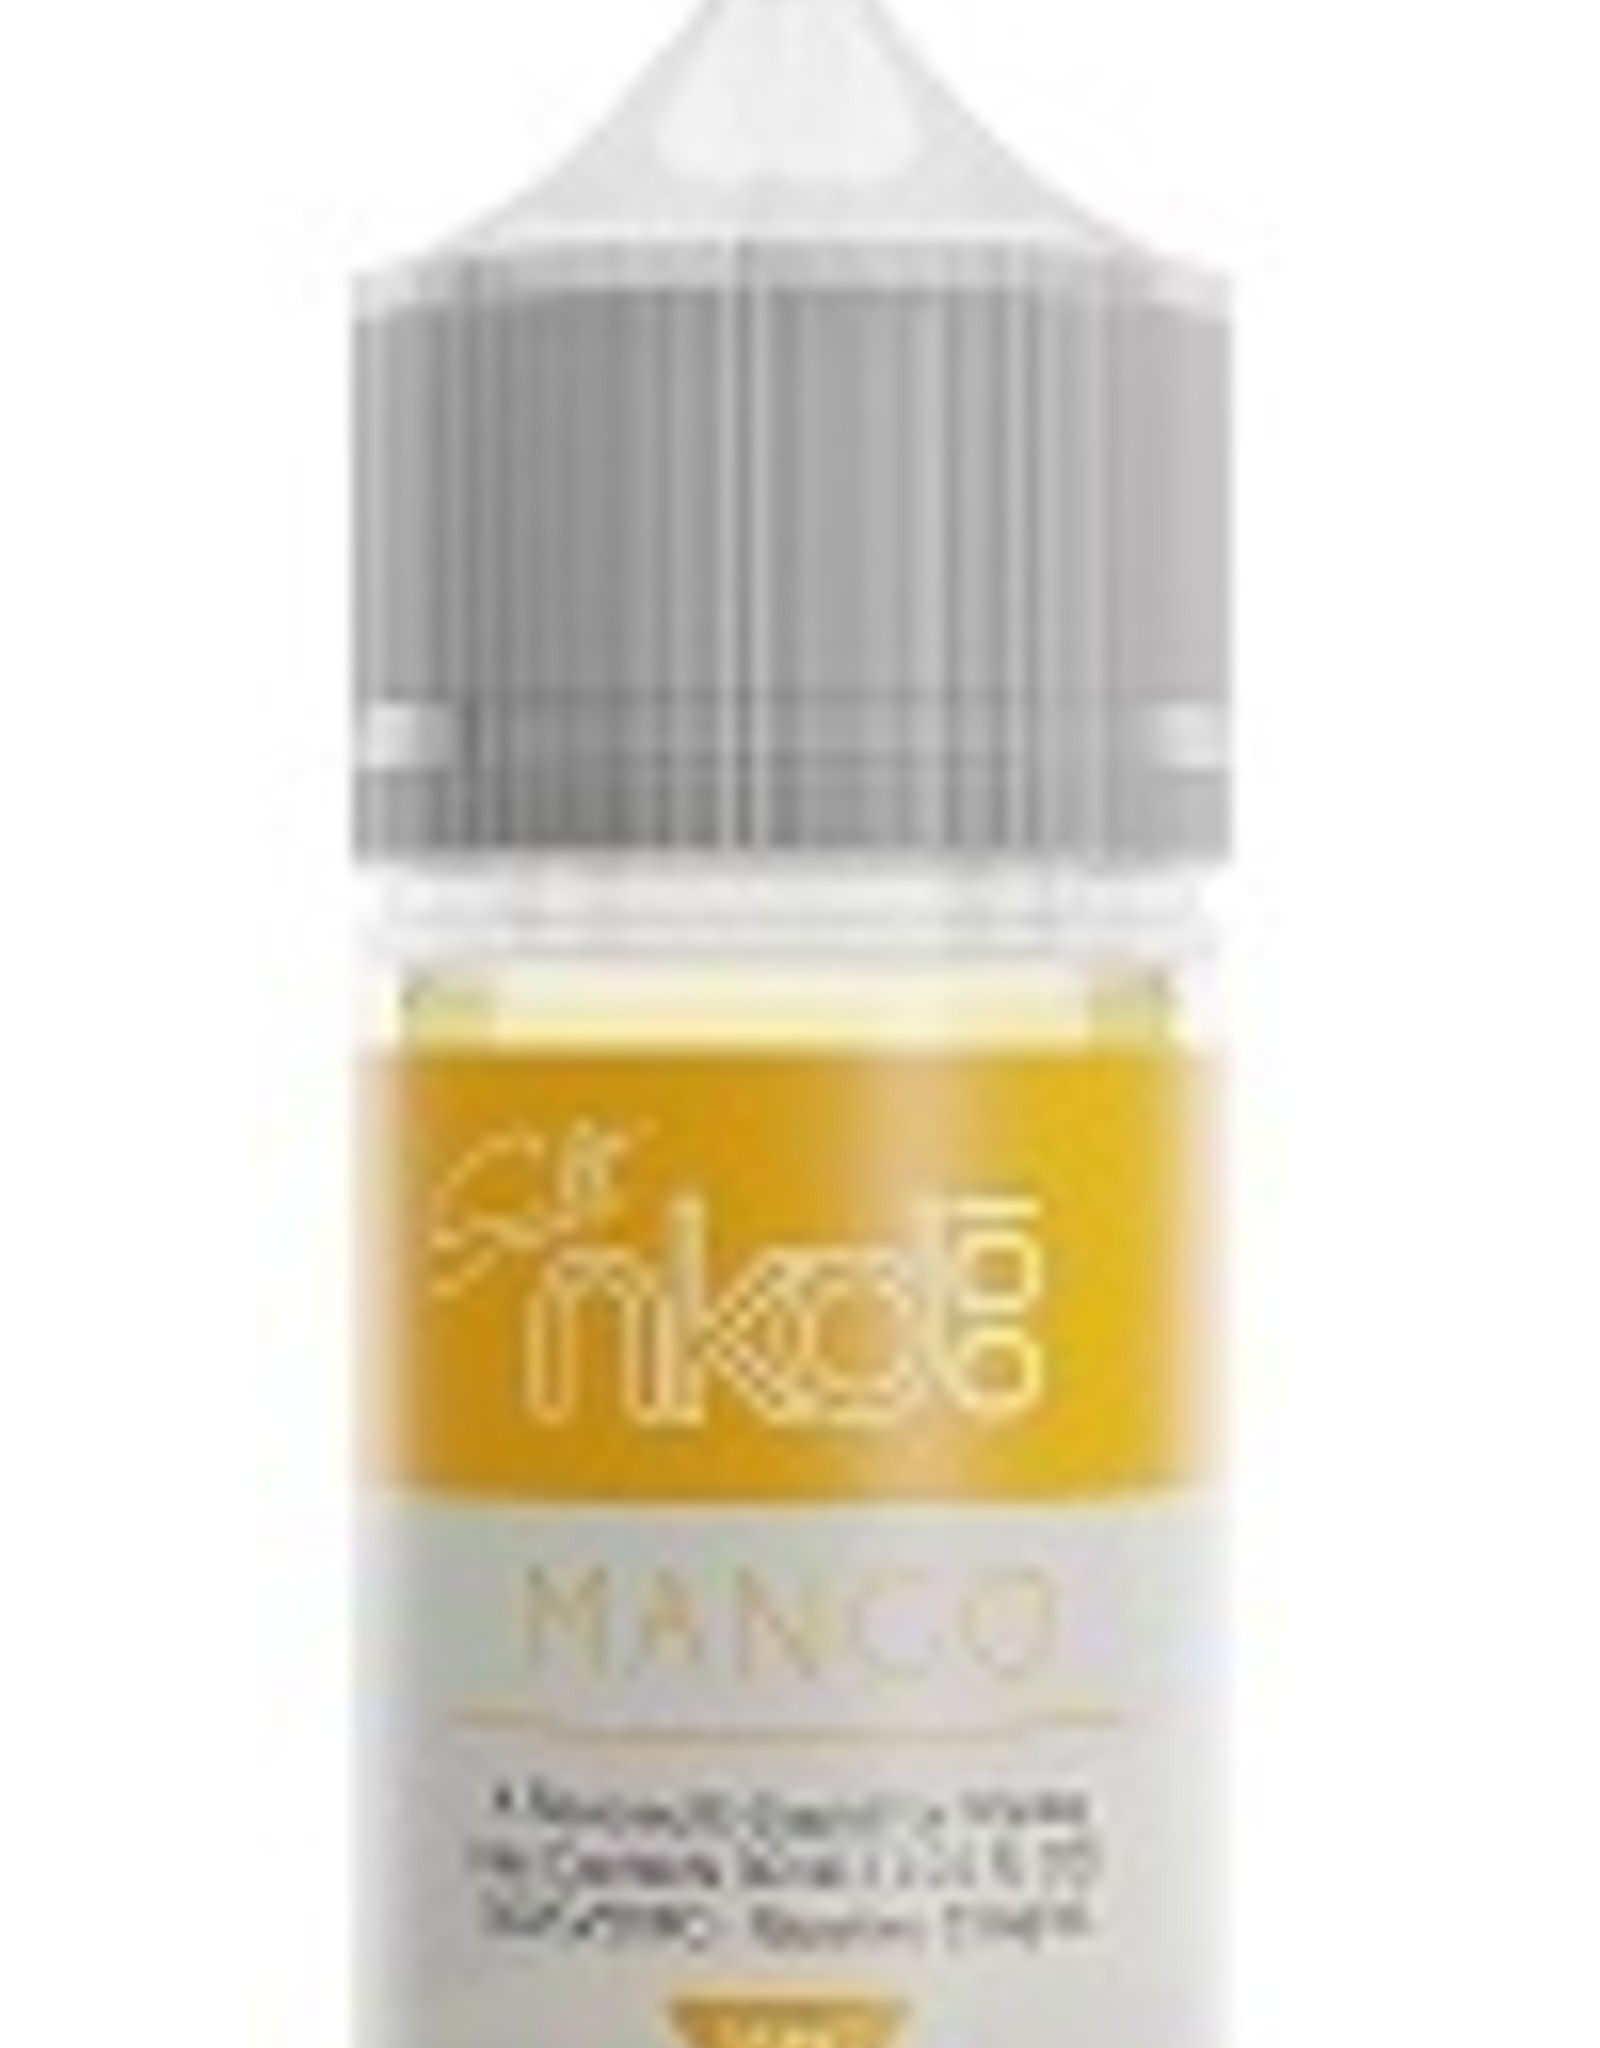 Mango Salts By Naked 100 Salts (Amazing Mango)